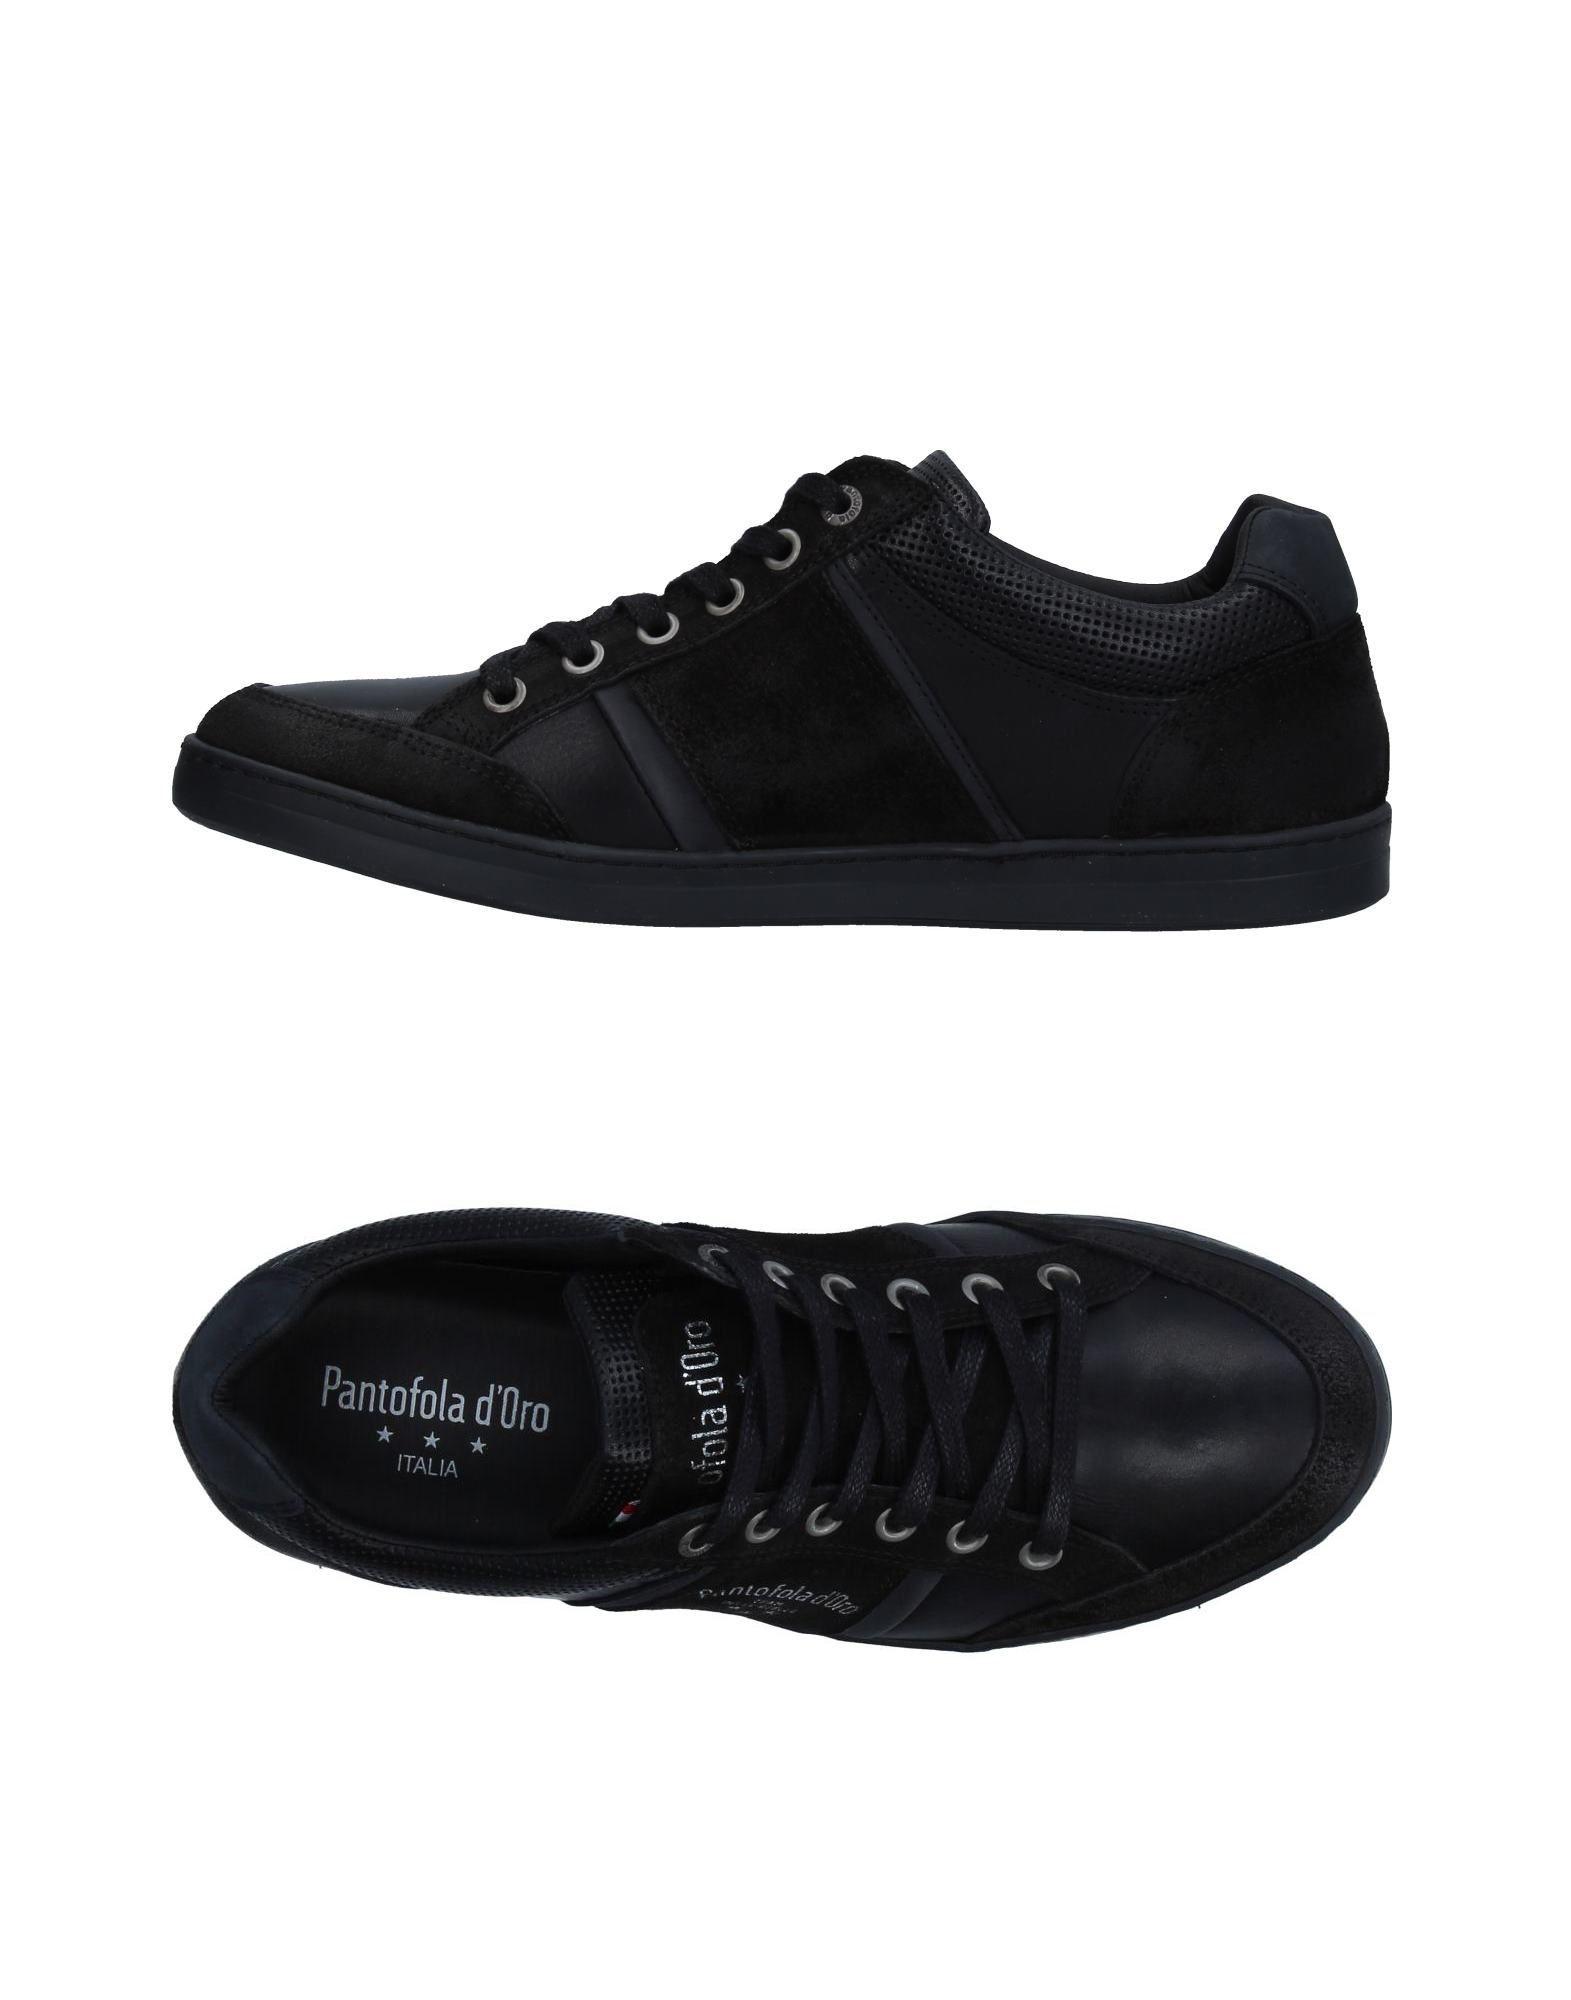 Rabatt echte Schuhe Pantofola D'oro Sneakers Herren  11338468BU